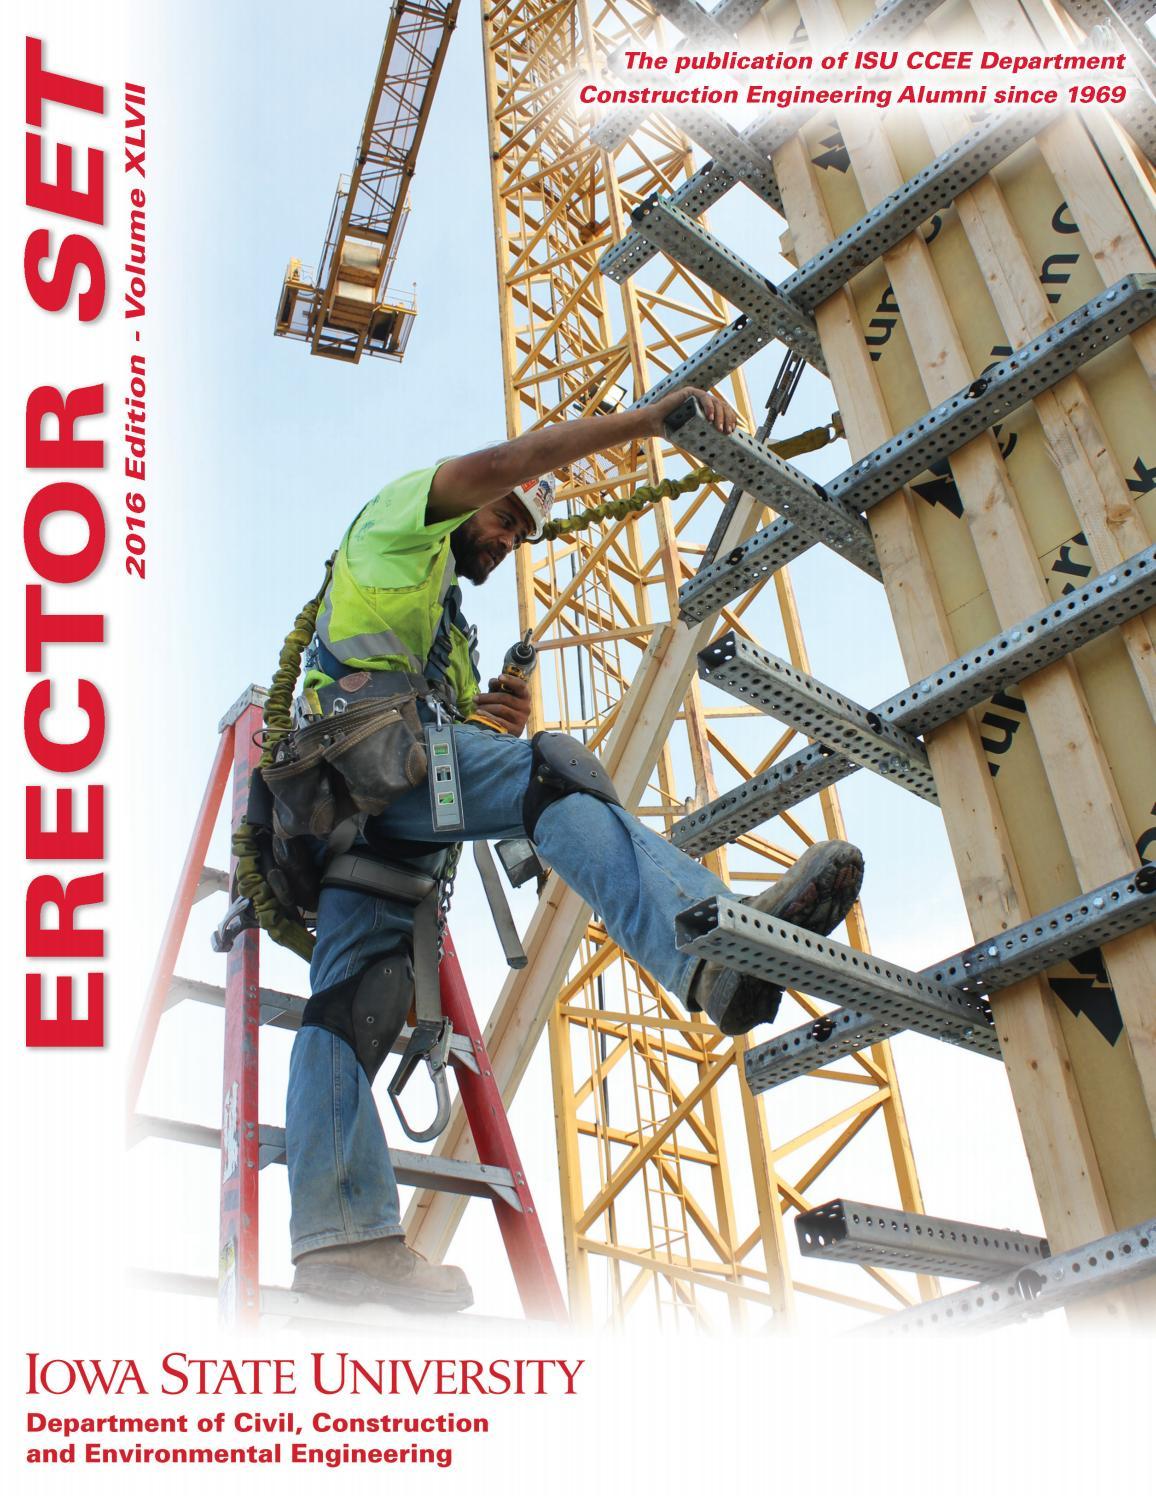 2016 Erector Set-Iowa State University Construction